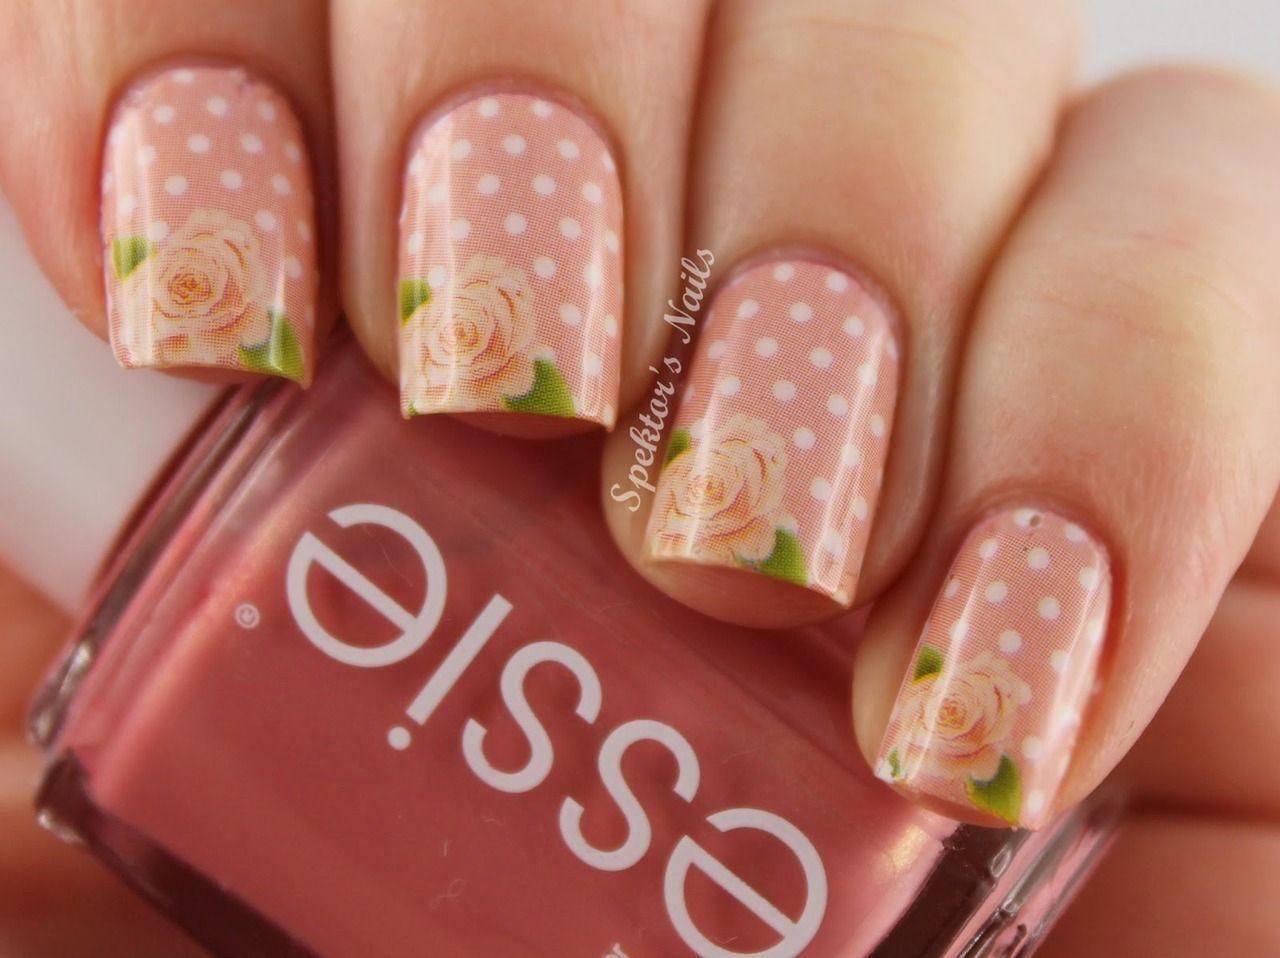 Essie essiepolish nailideas naildesign peachy simplenails